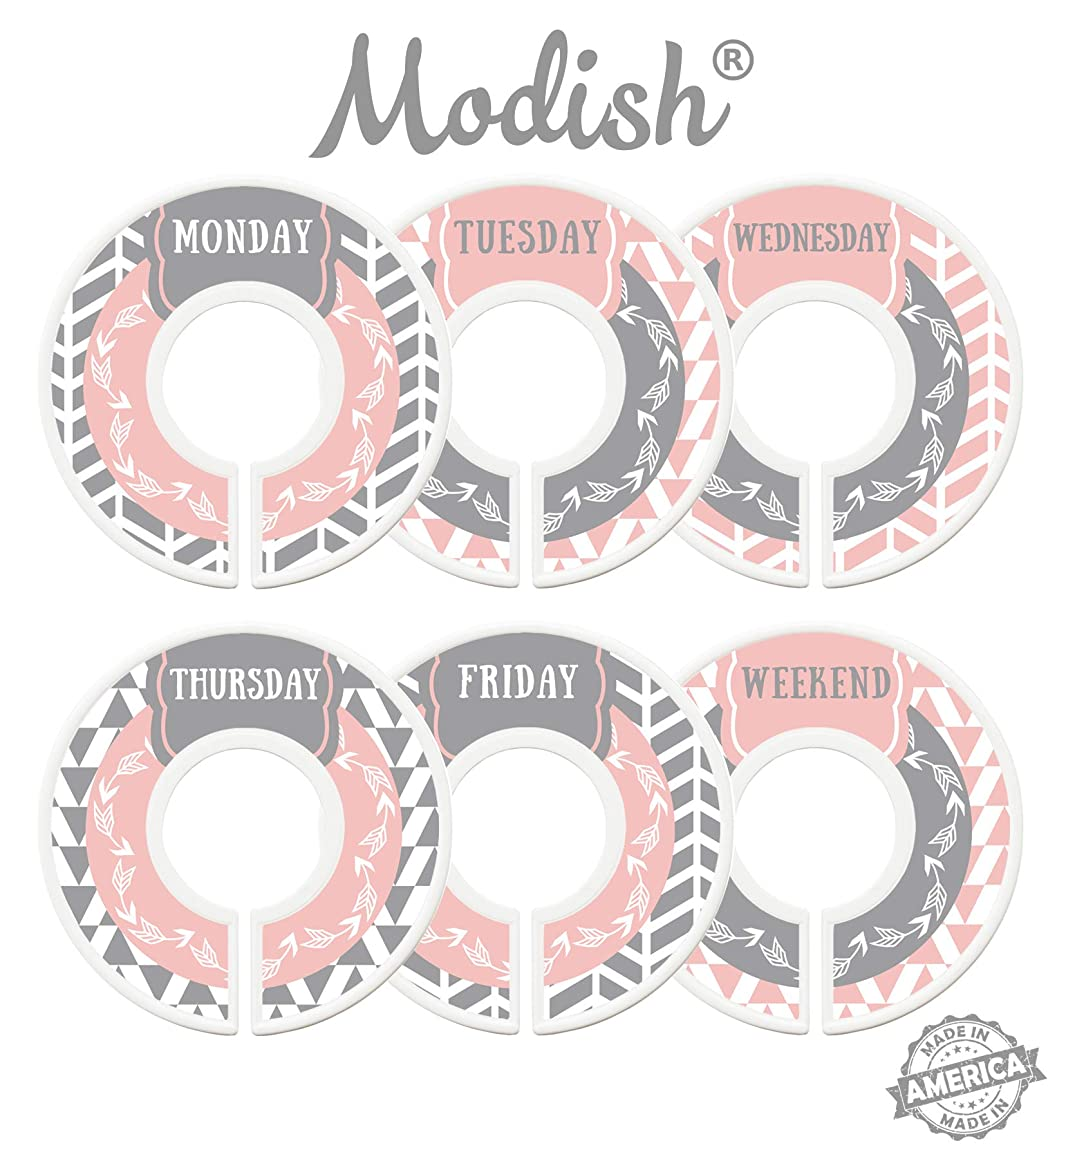 Modish Labels Daily Clothes Organizers, Days of Week Closet Dividers, Closet Organizers, School Supplies, Work Week Clothes Organizer, Girl, Woman, Women, Arrows, Tribal, Pink, Grey, Gray (Days)